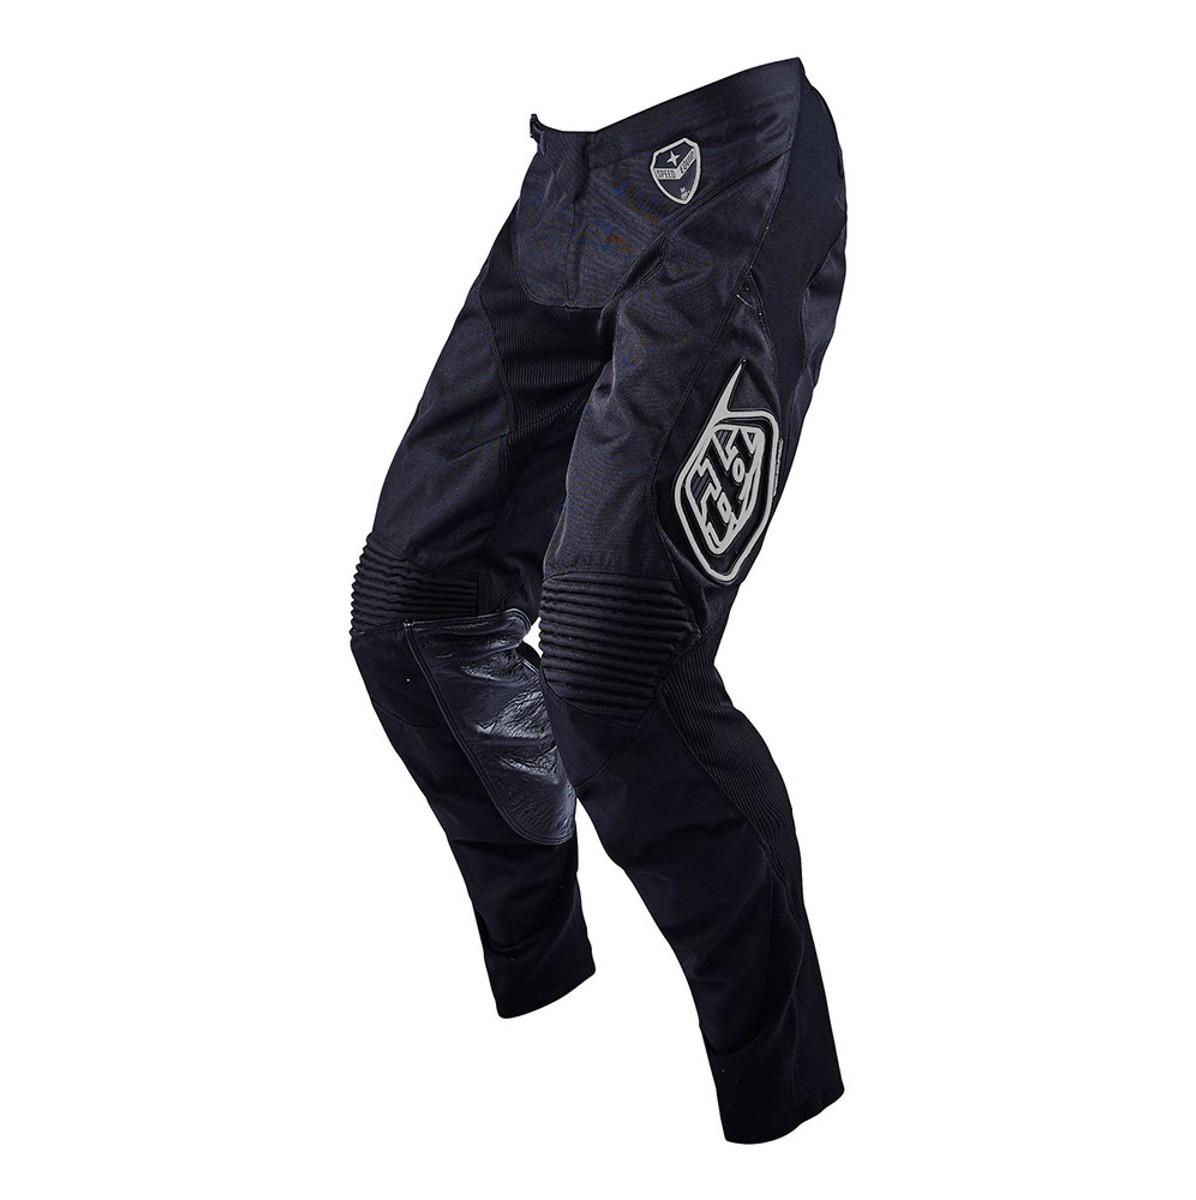 TLD SE Moto Pant - Starburst Black